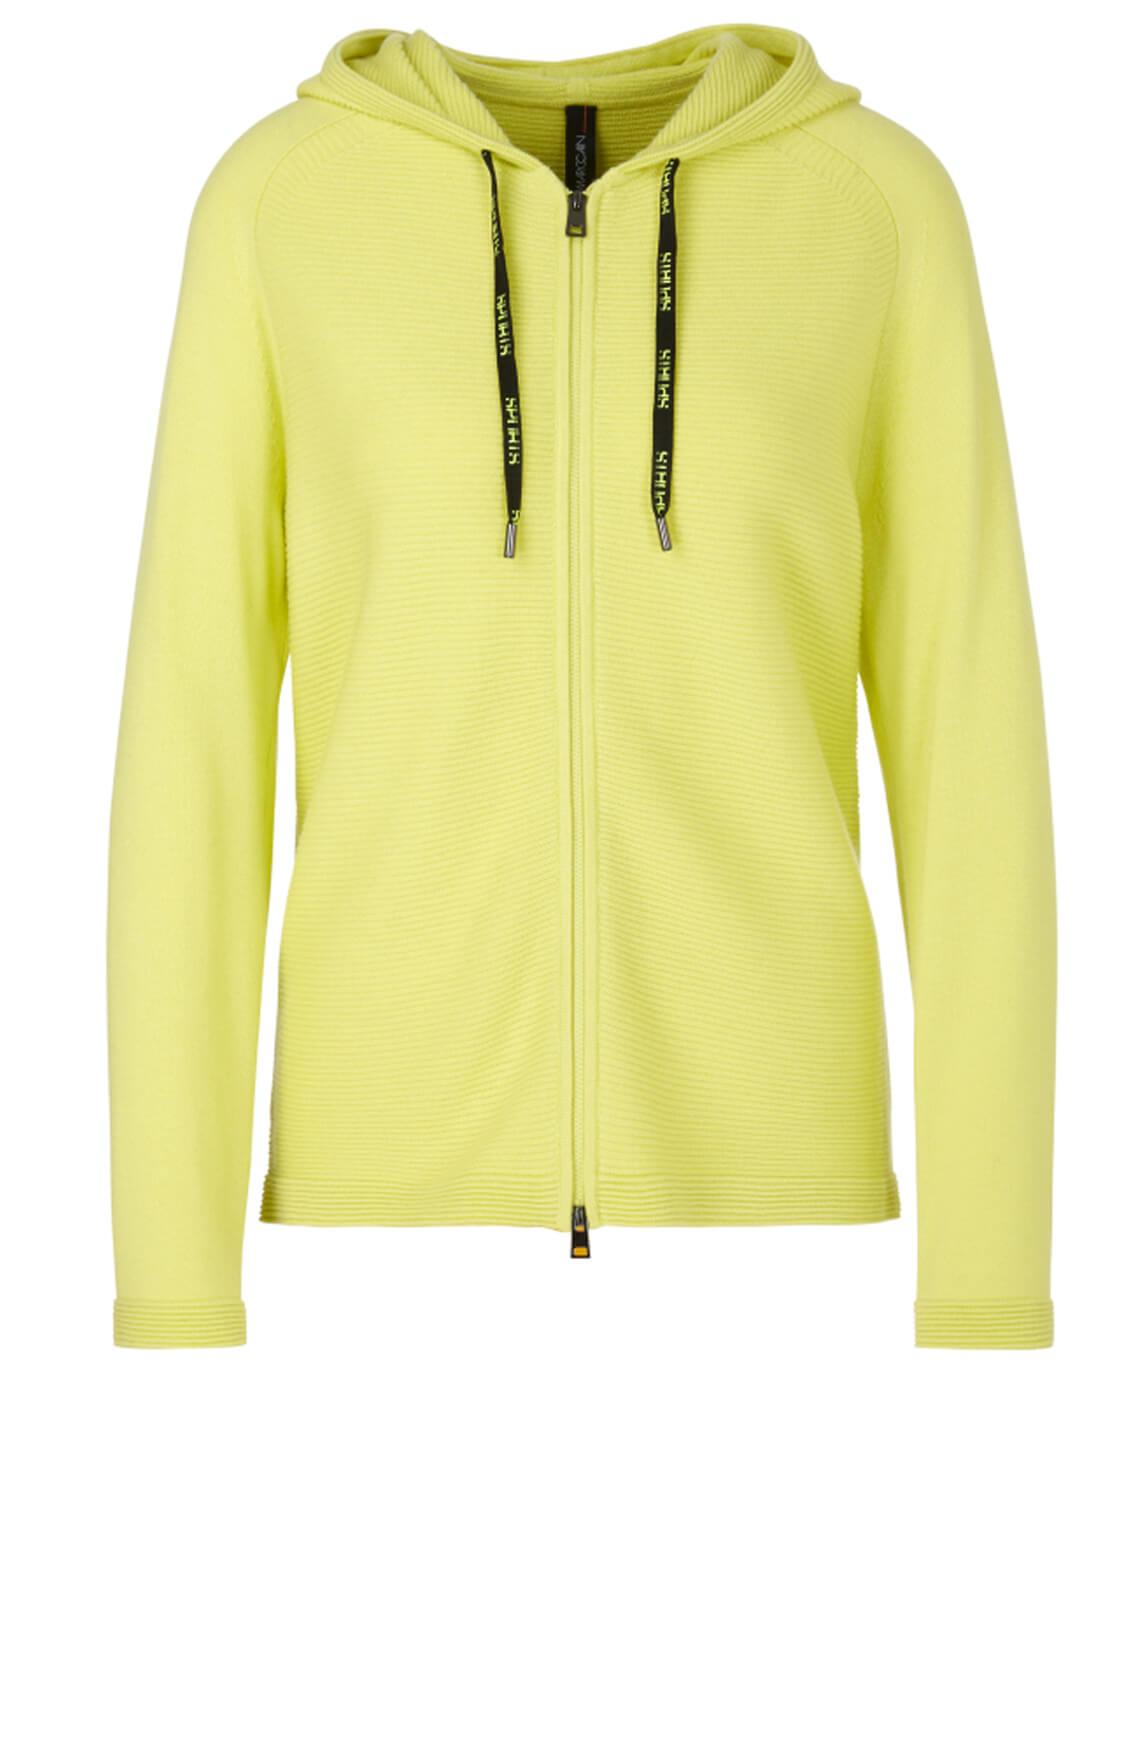 Marccain Sports Dames Vest met cashmere geel